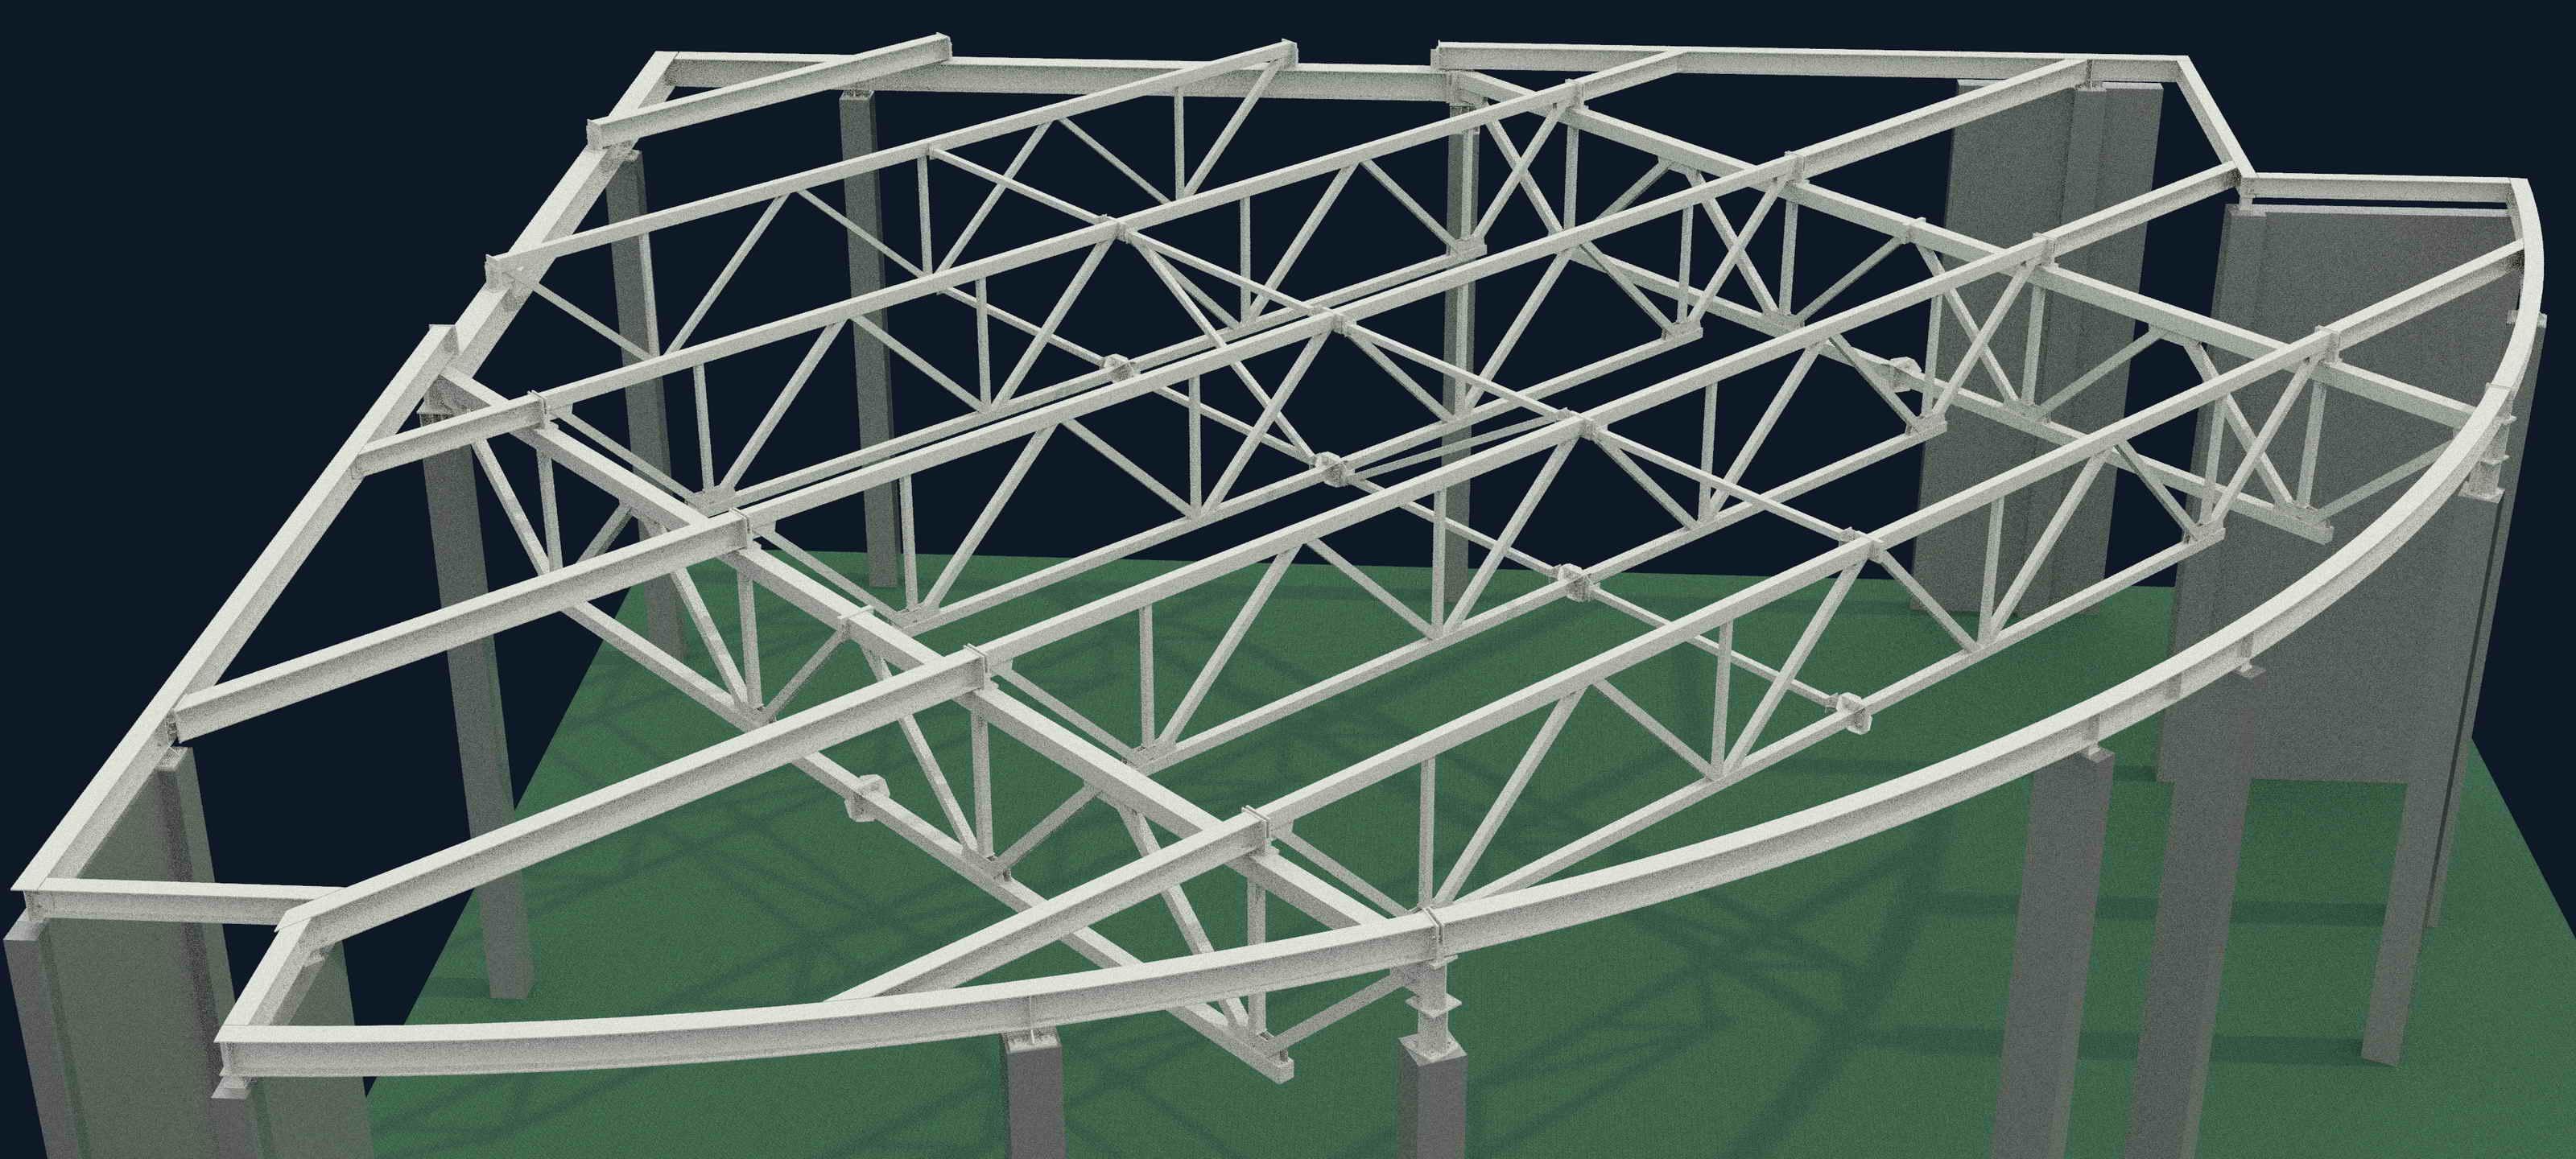 КМД металлоконструкций